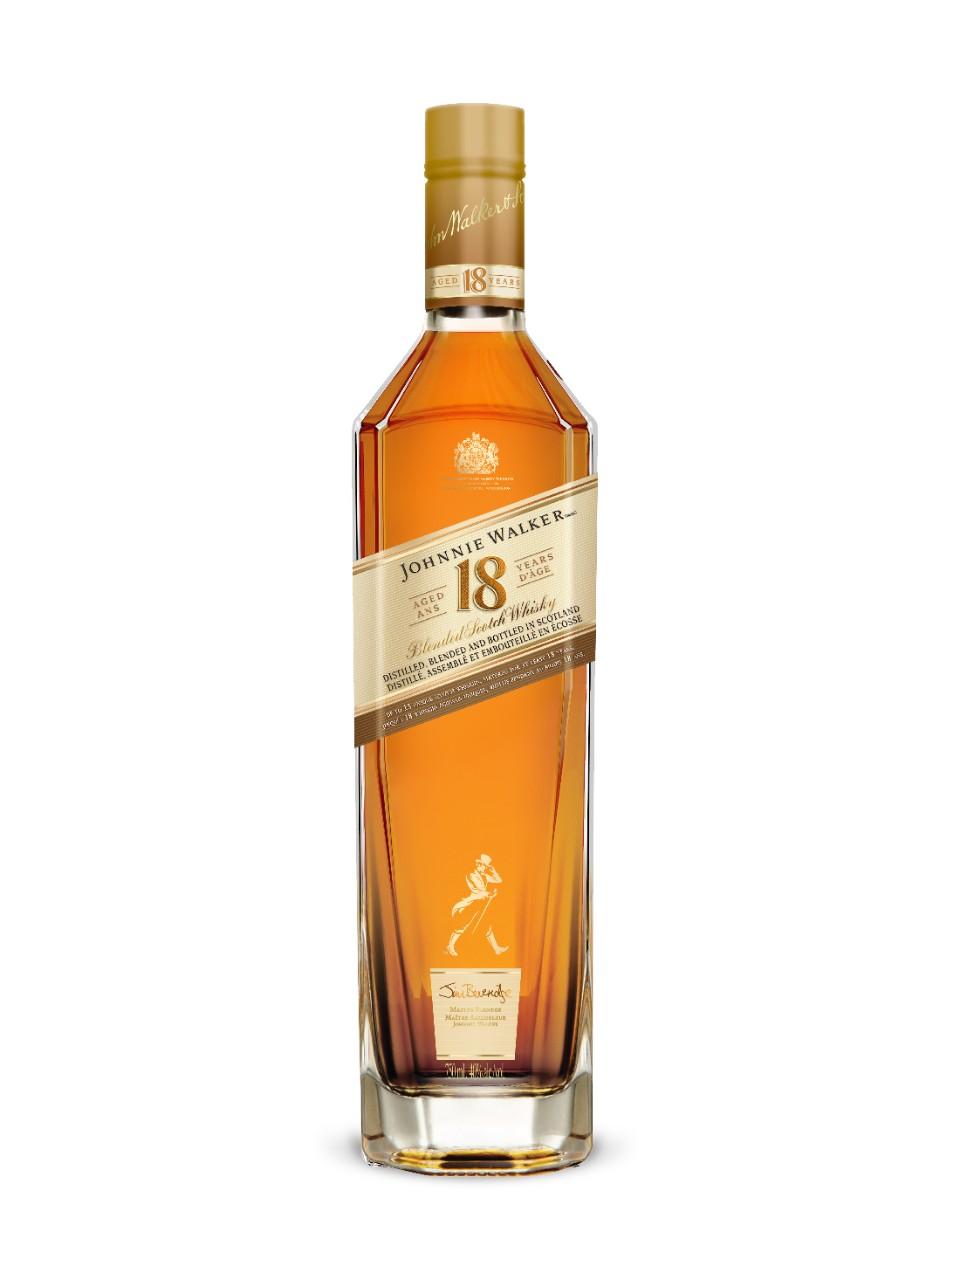 Johnnie Walker Prices By Color : johnnie, walker, prices, color, Johnnie, Walker, Scotch, Whisky